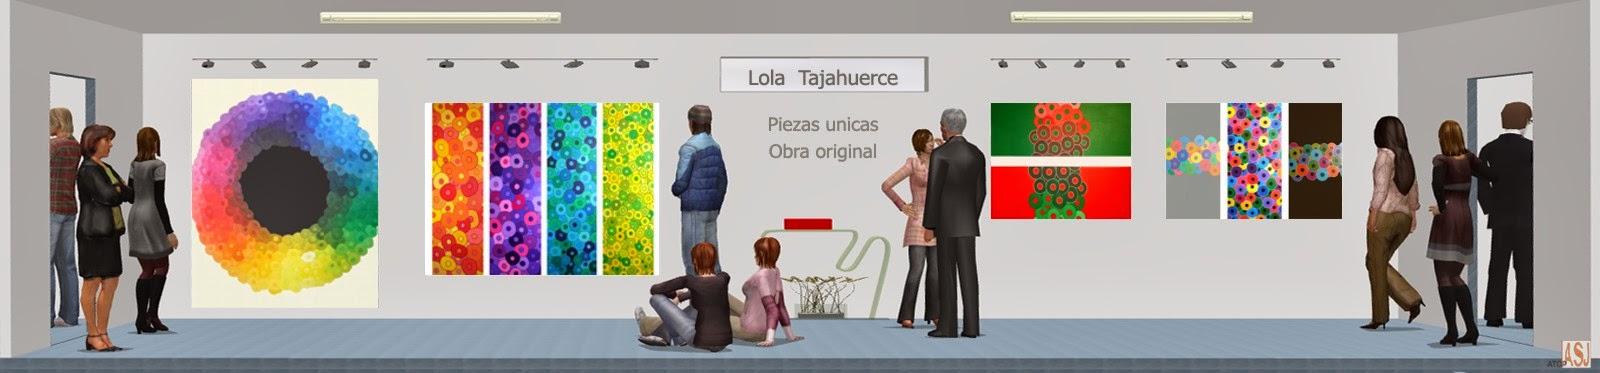 "<img src=""http://2.bp.blogspot.com/-zARdoIa9TE4/UsqwGD-LazI/AAAAAAAAS8k/XdAeyxt6f1E/s1600/sala-de-exposicion-virtual-de-lola-tajahuerce.jpg"" alt="" sala de exposicion virtual de pinturas de lola tajahuerce""/>"